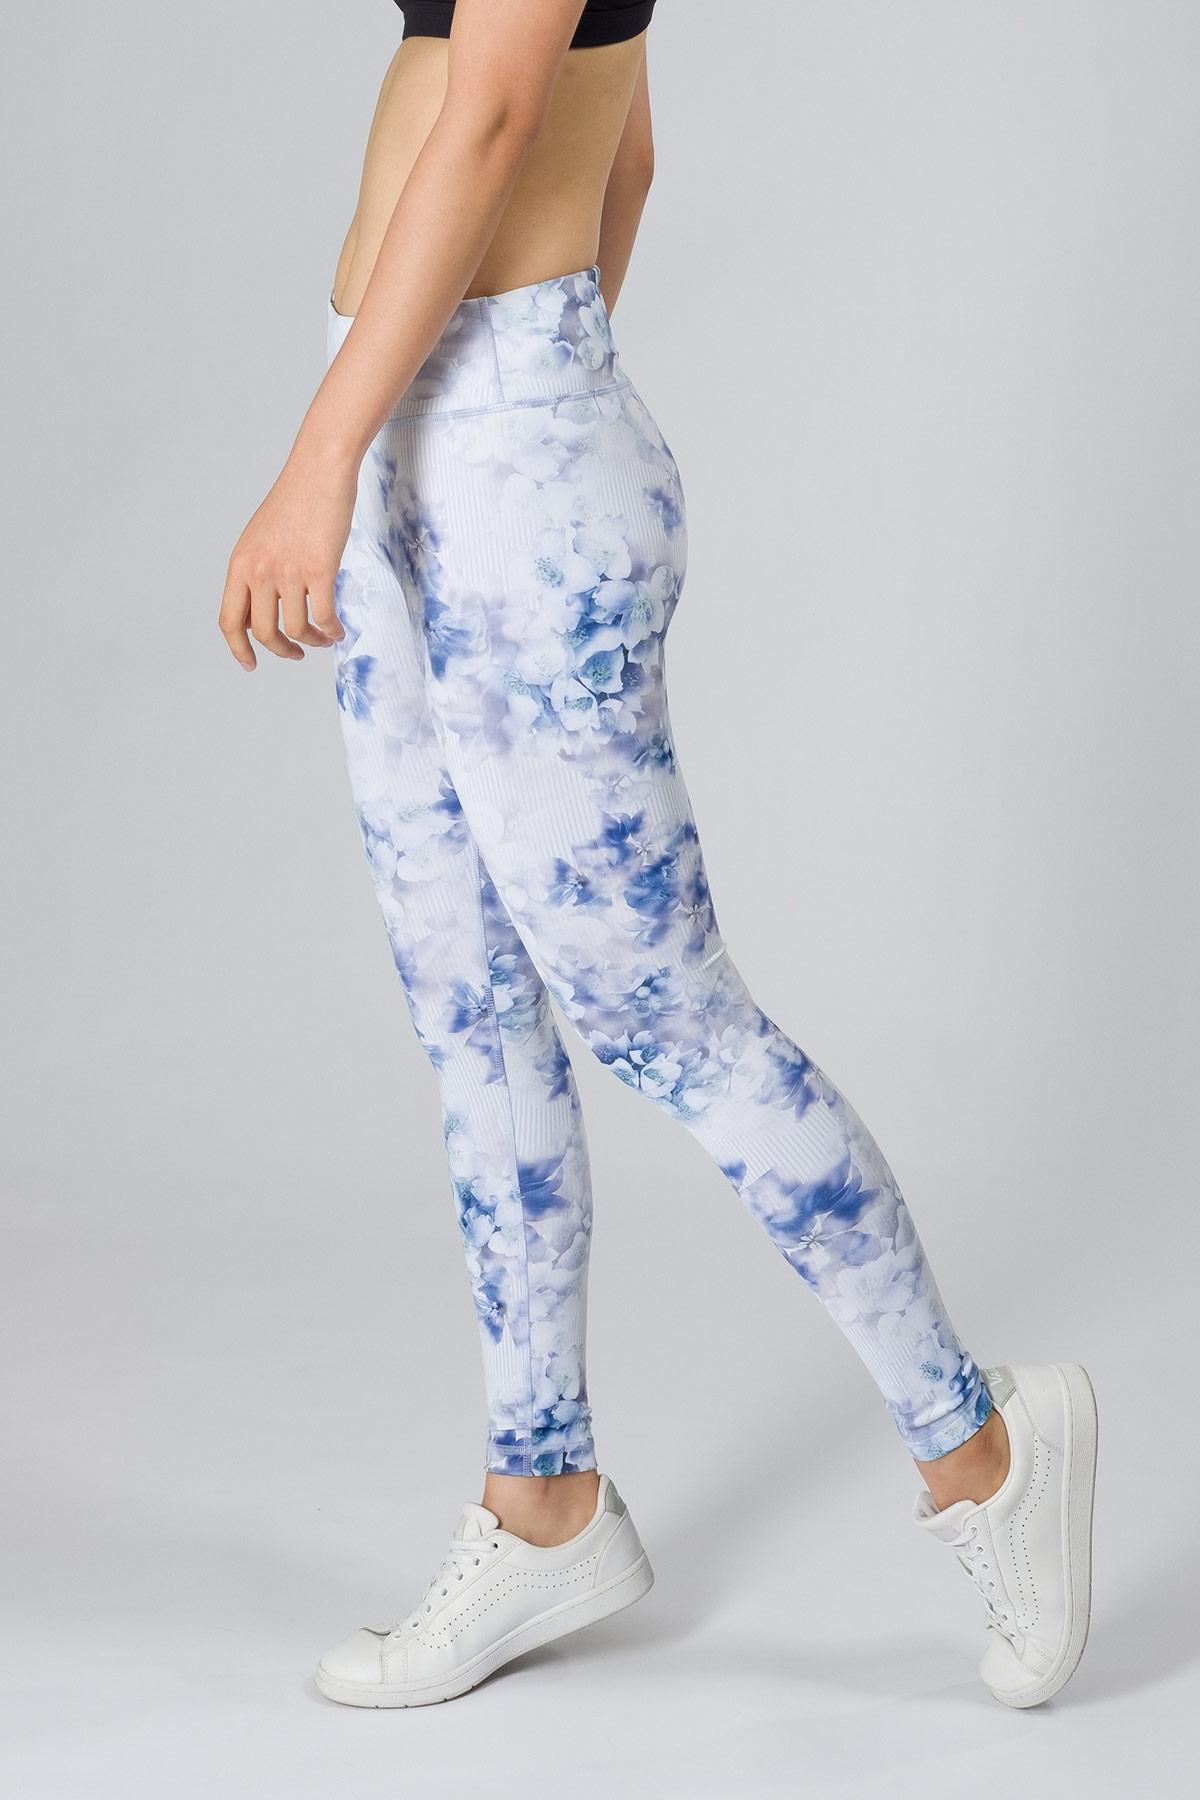 Oomph Legging – Jasmine